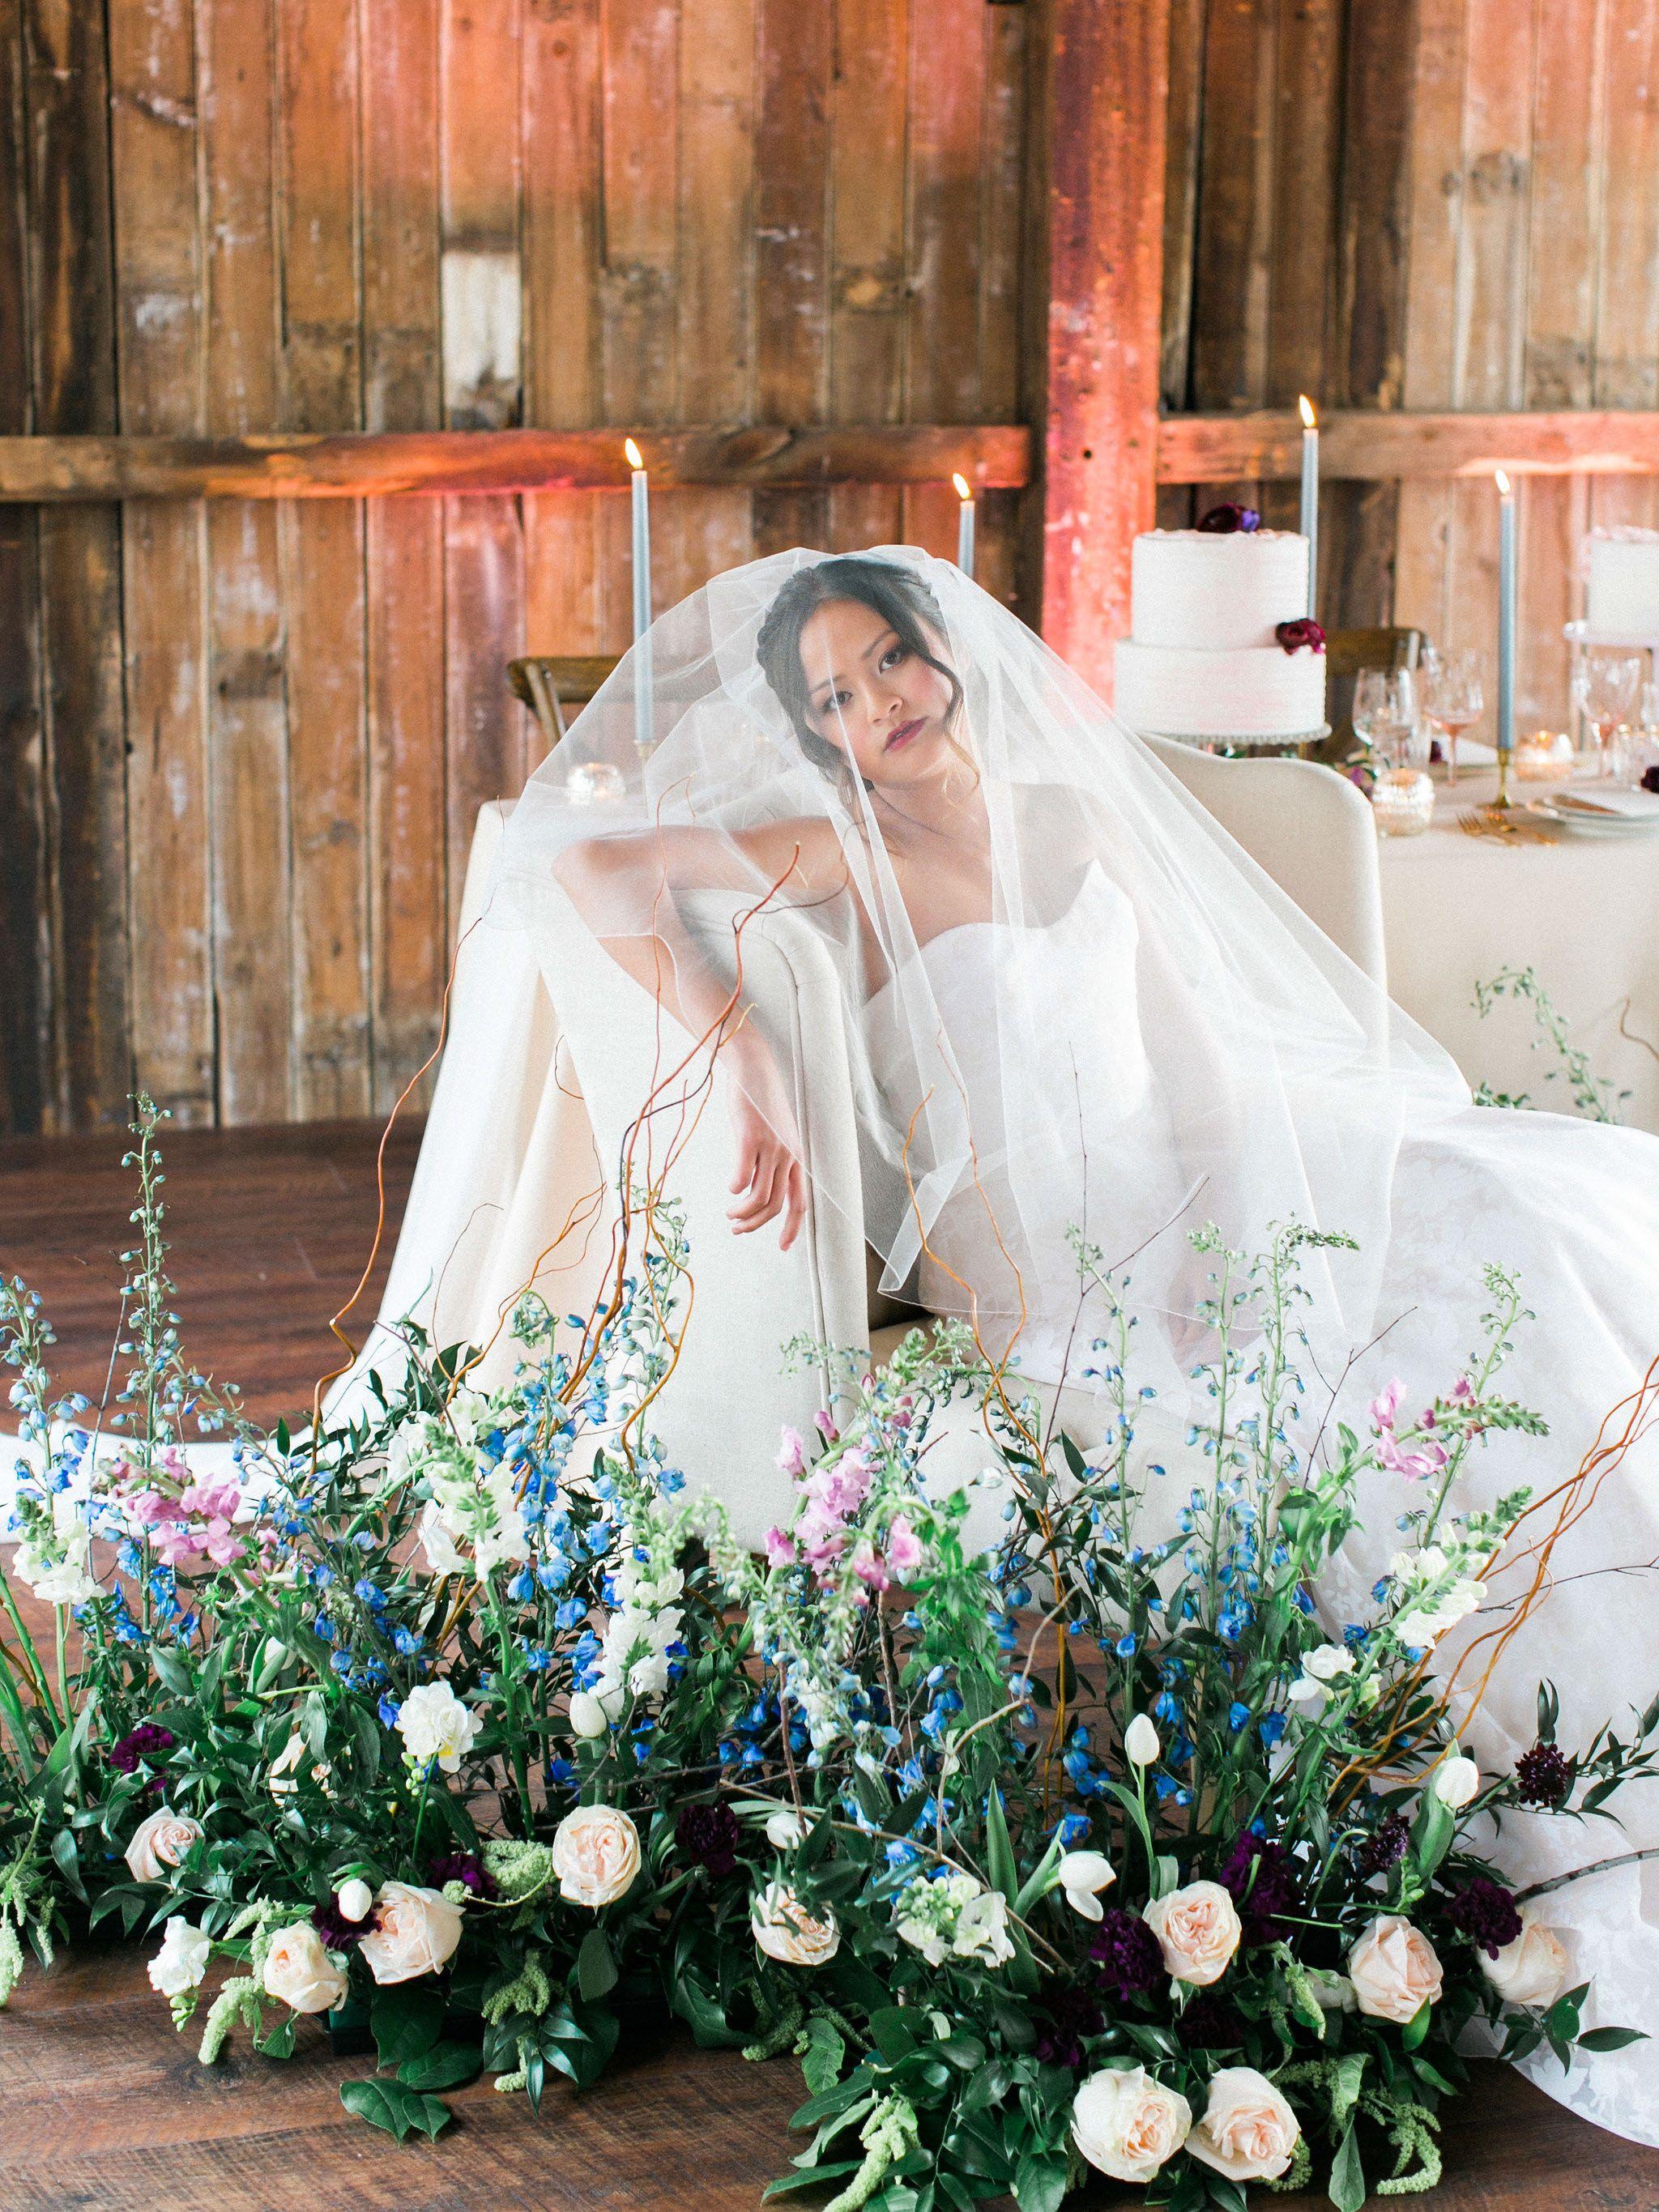 Unique romantic wedding ideas Modern wedding flower design